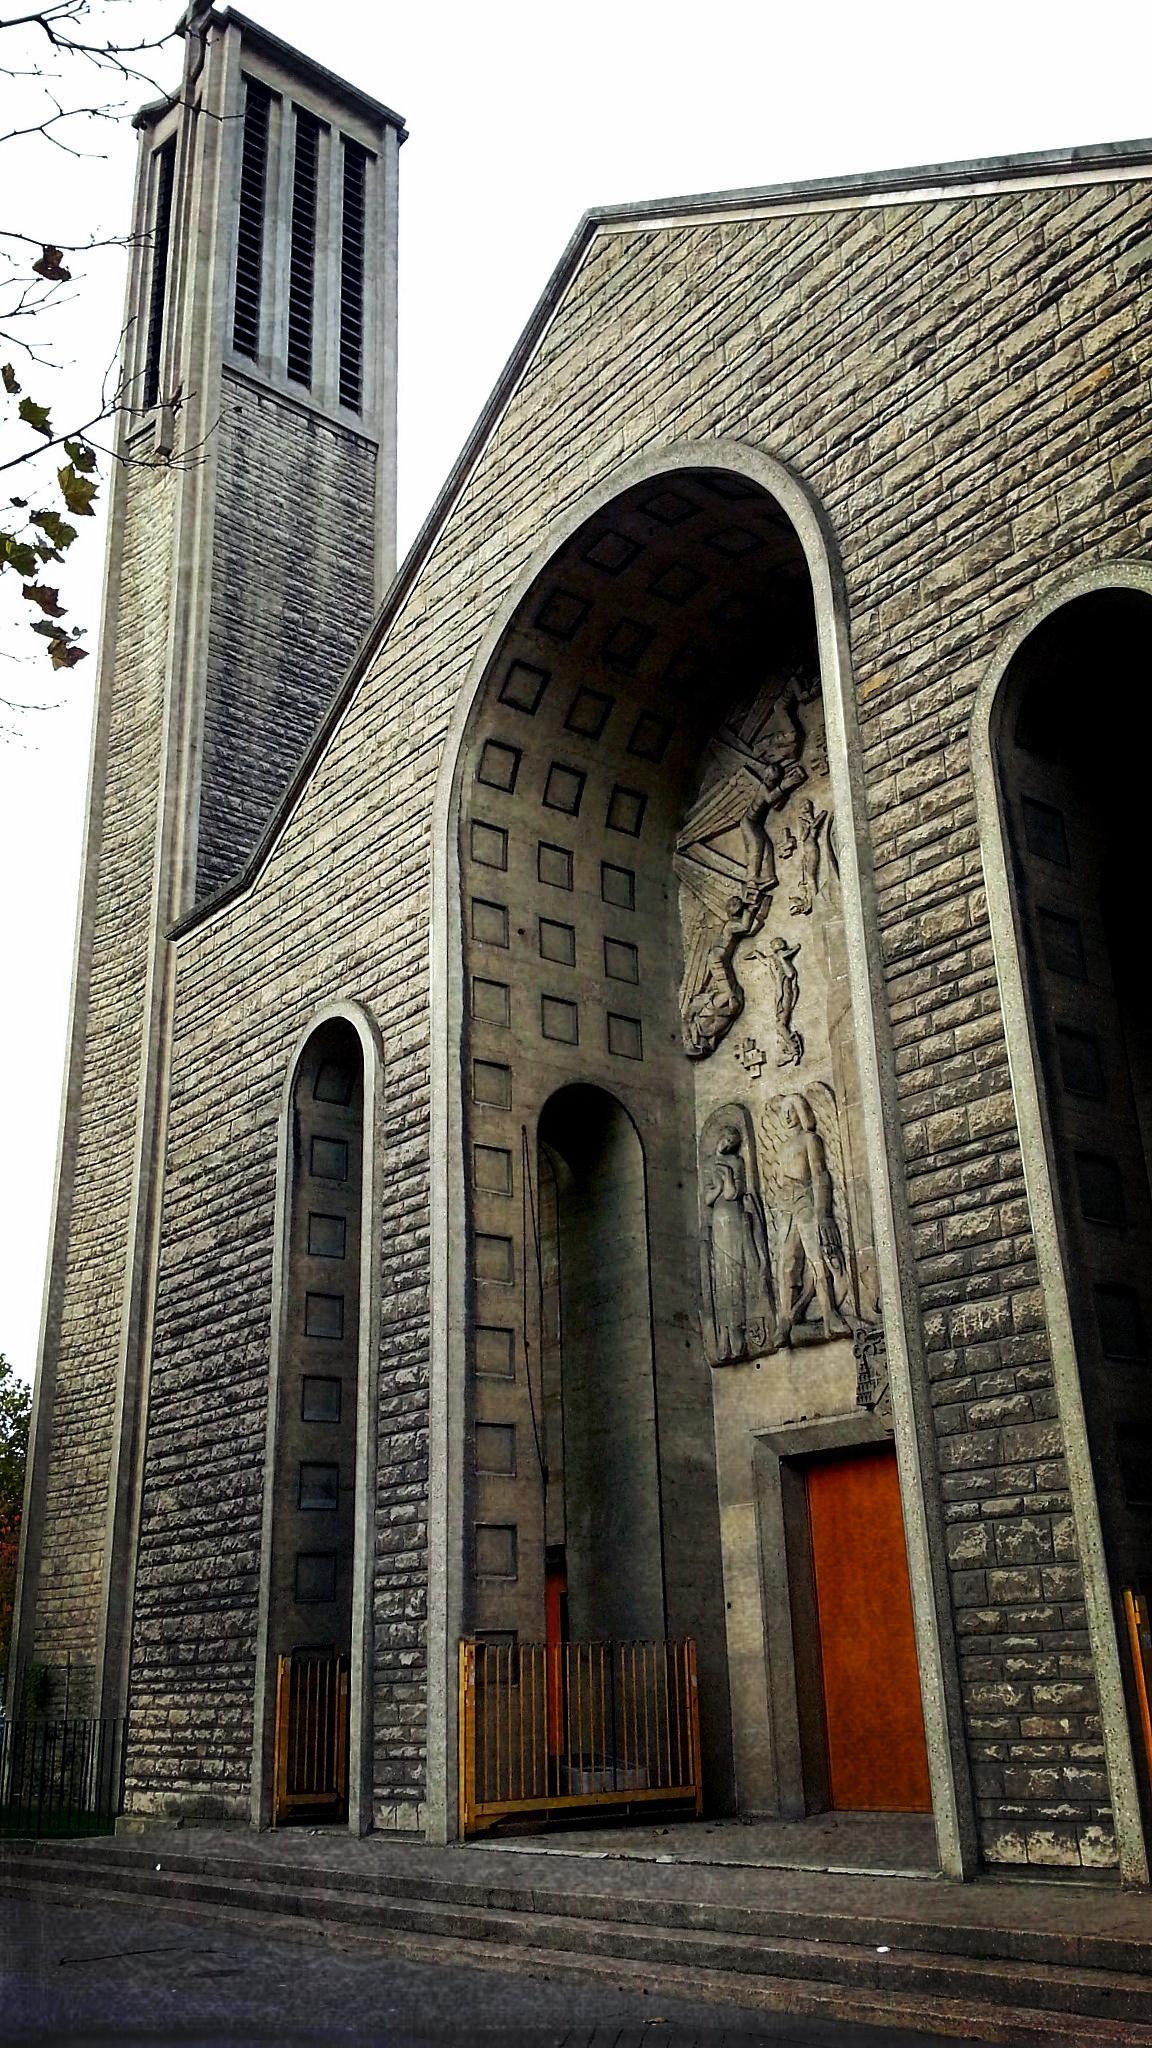 Dechantal church